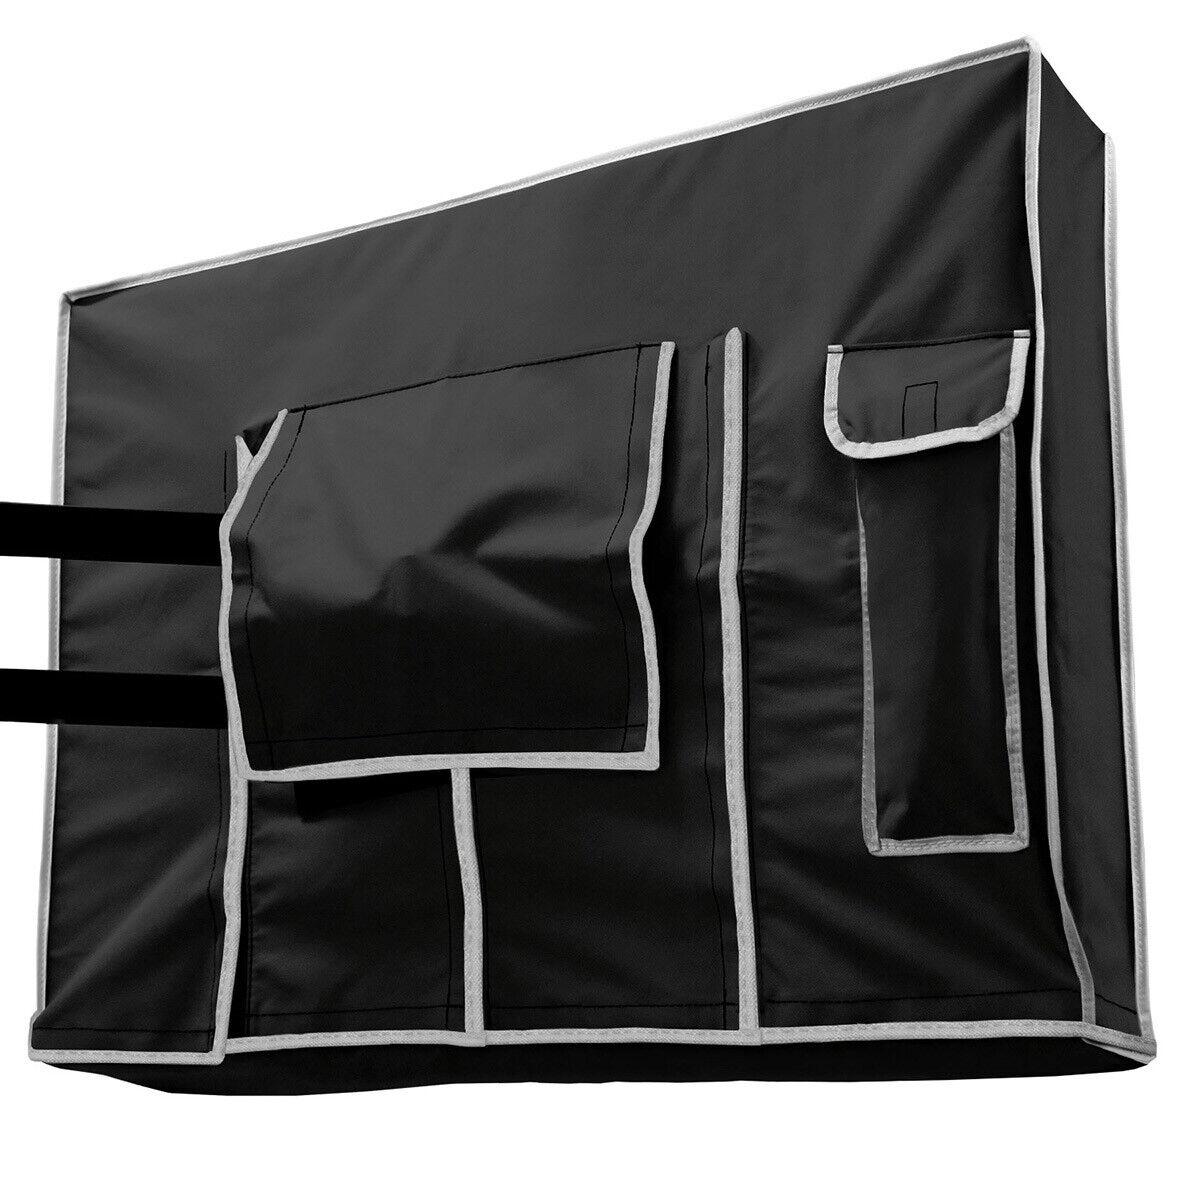 Premium 32 inch Outdoor TV Cover - Weatherproof Television P